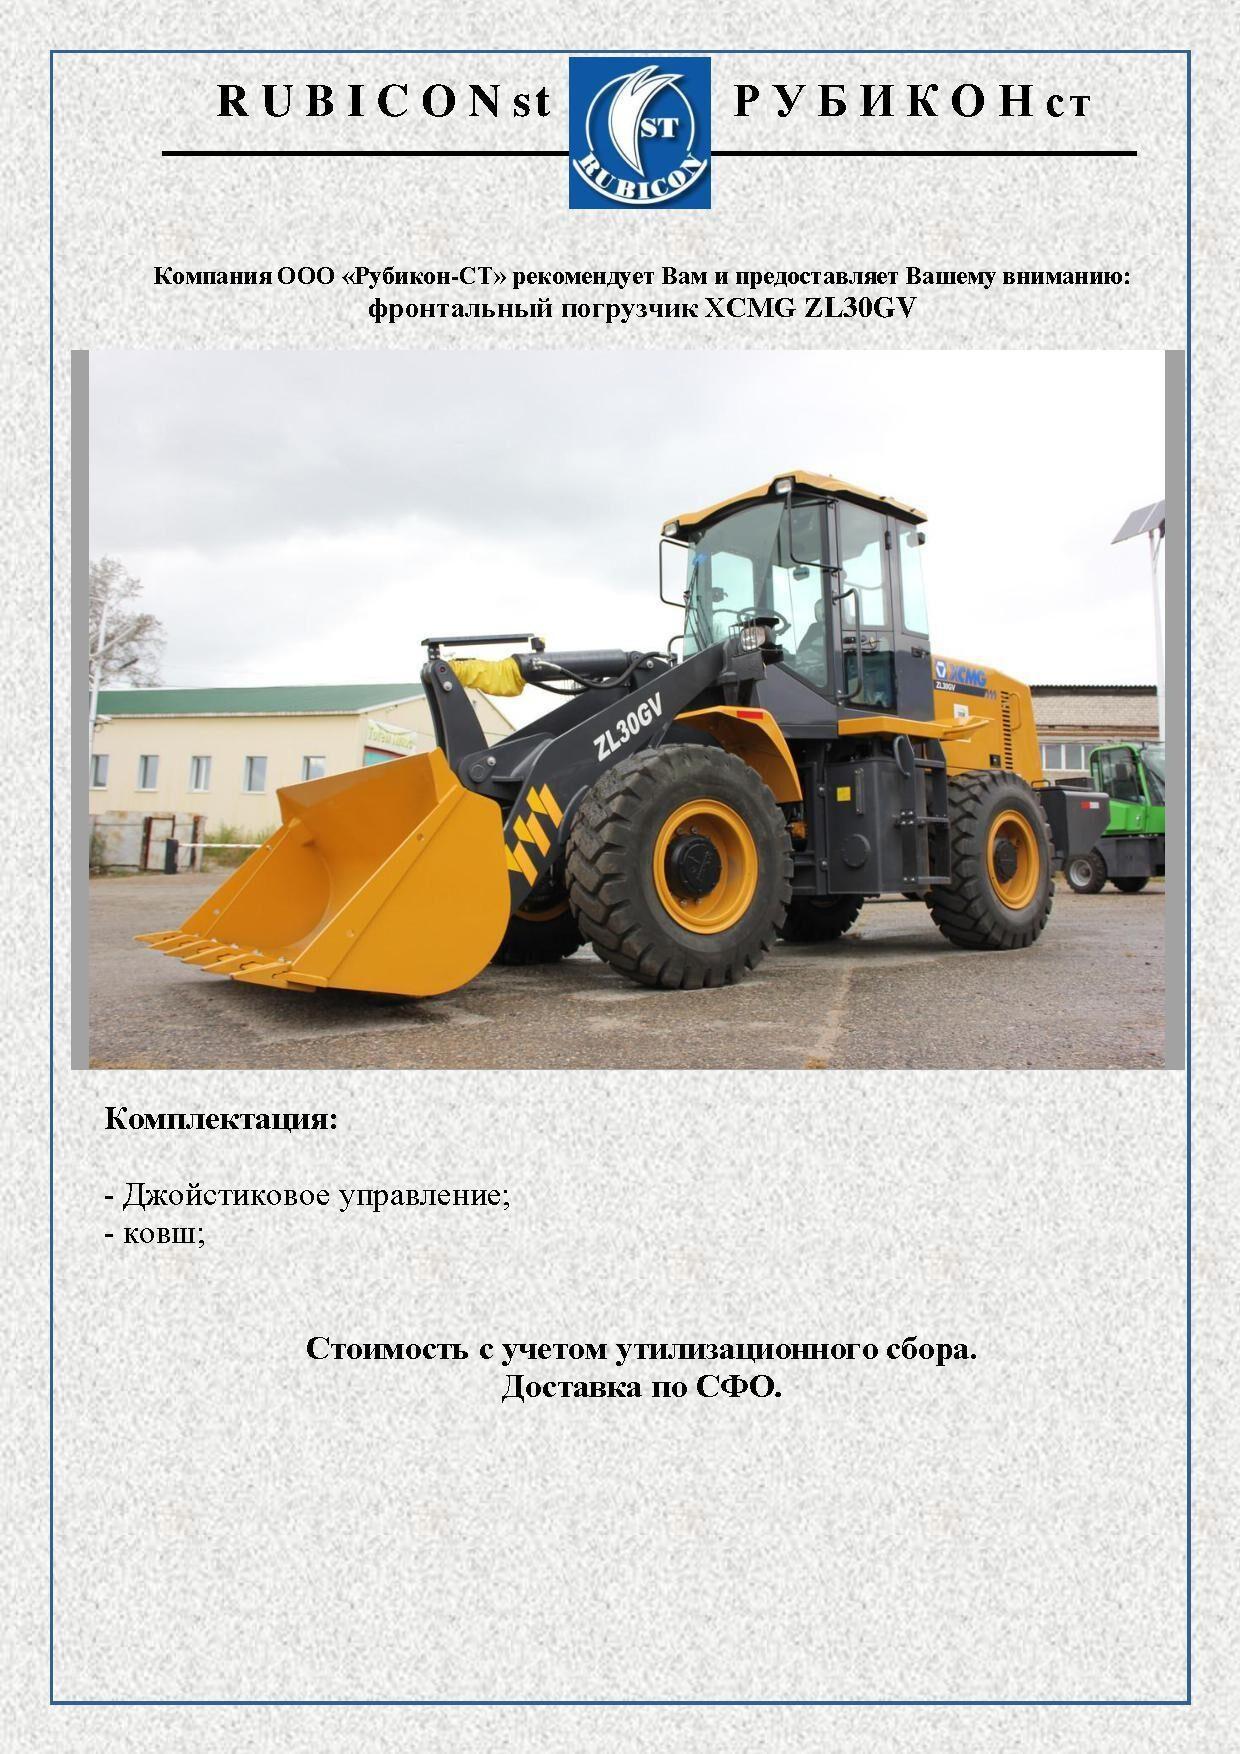 П ZL30GV 1